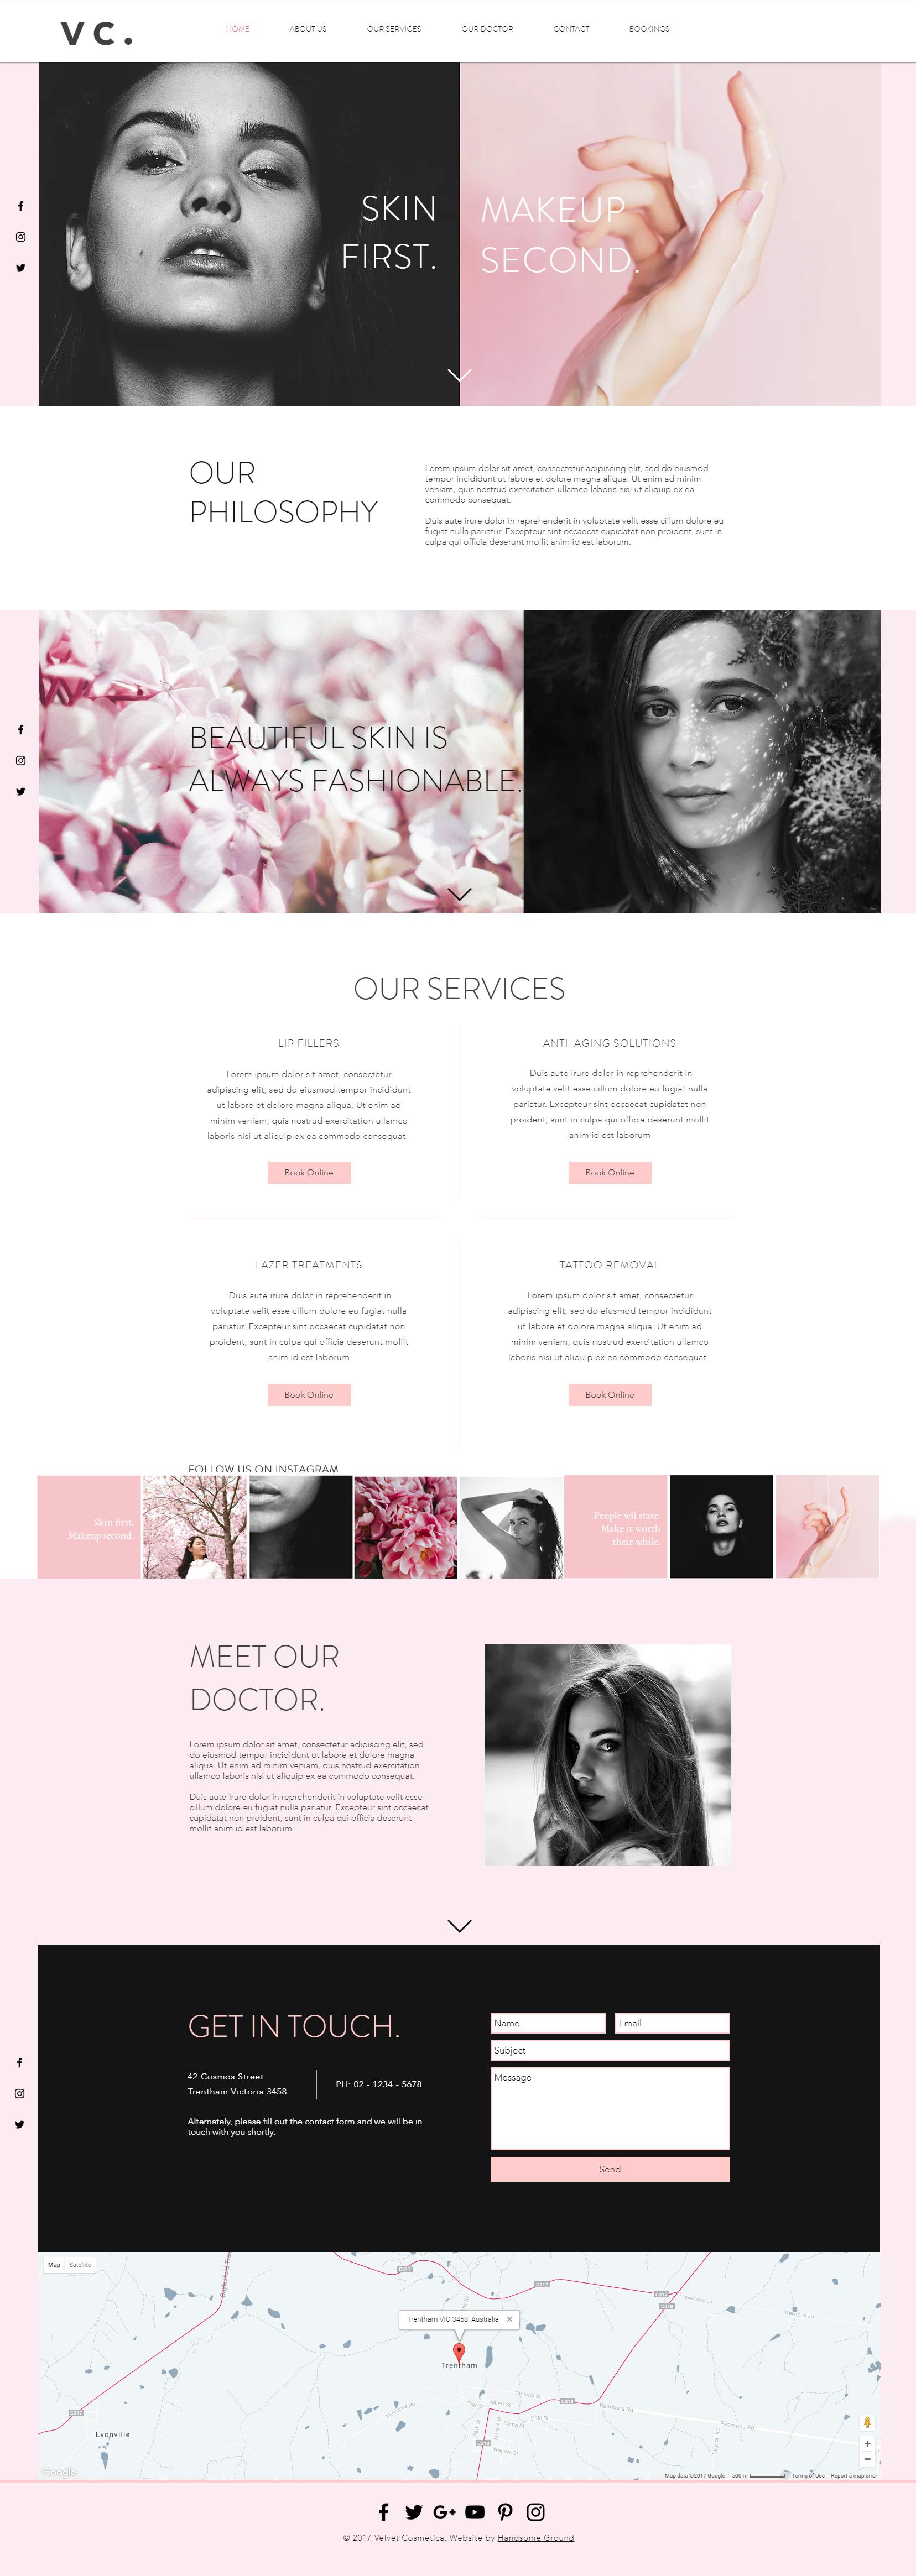 Cosmetic Surgeon Website designed by Handsome Ground Studio.jpg